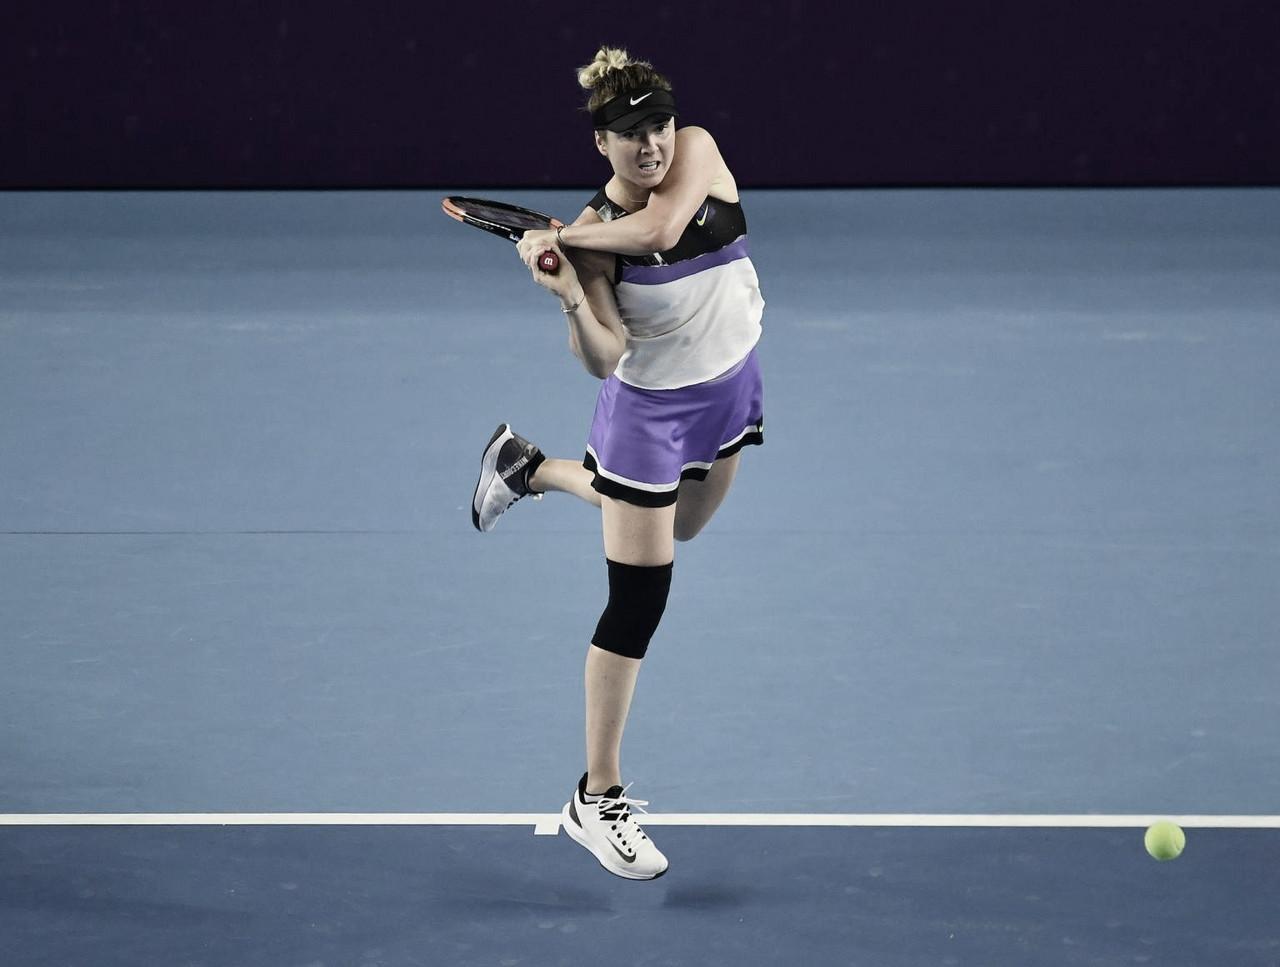 Svitolina devolve derrota de Roland Garros e elimina Muguruza em Wuhan